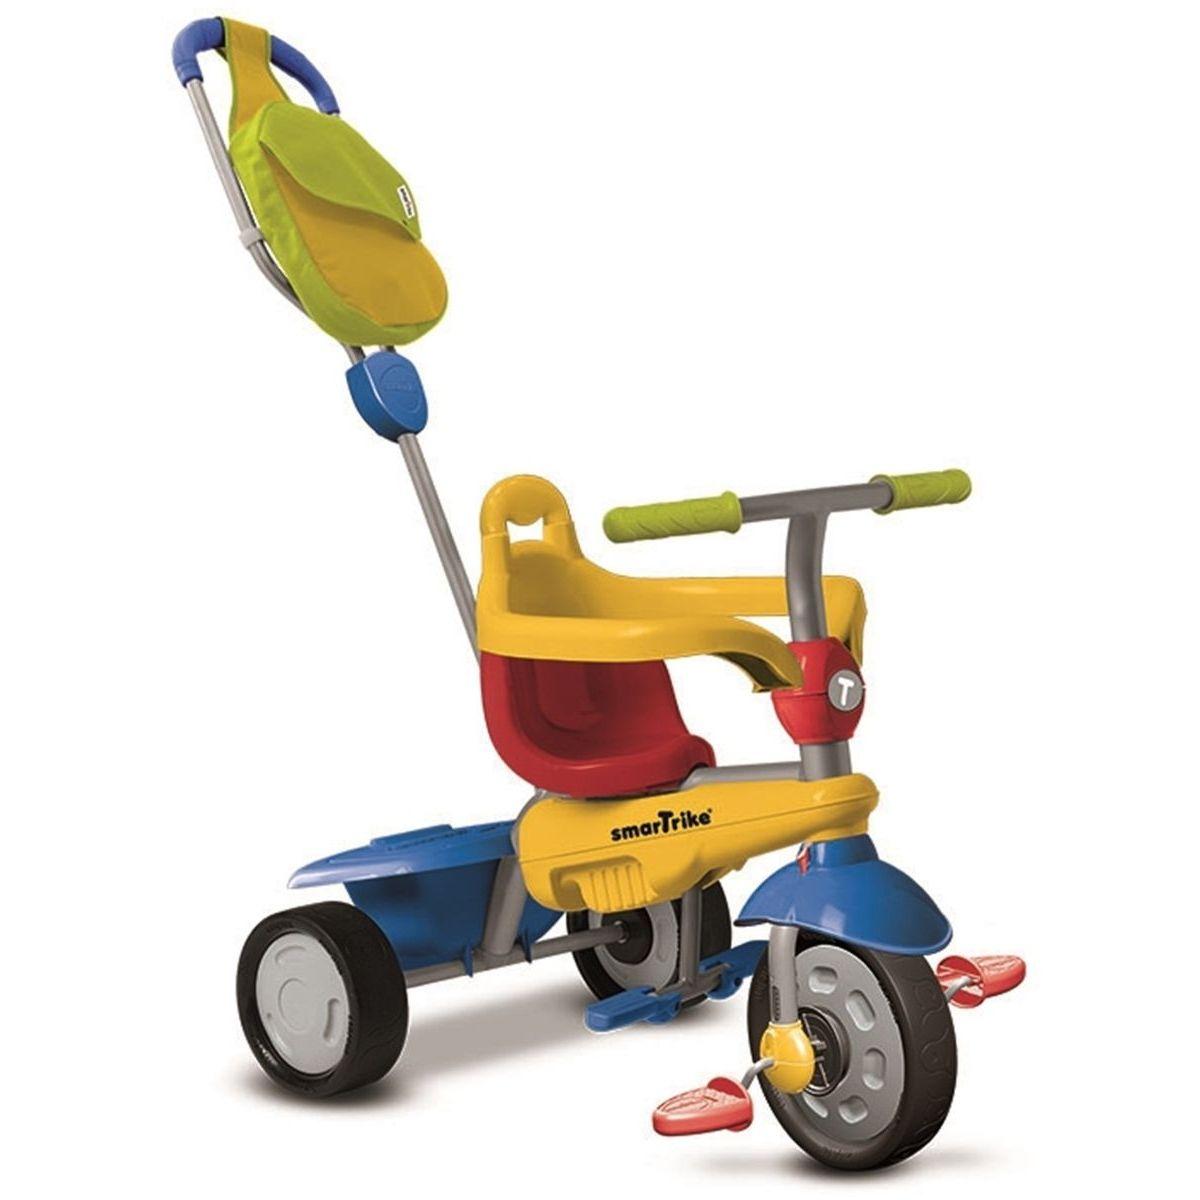 Smart Trike Trojkolka Breeze GL žlto-červeno-modrá